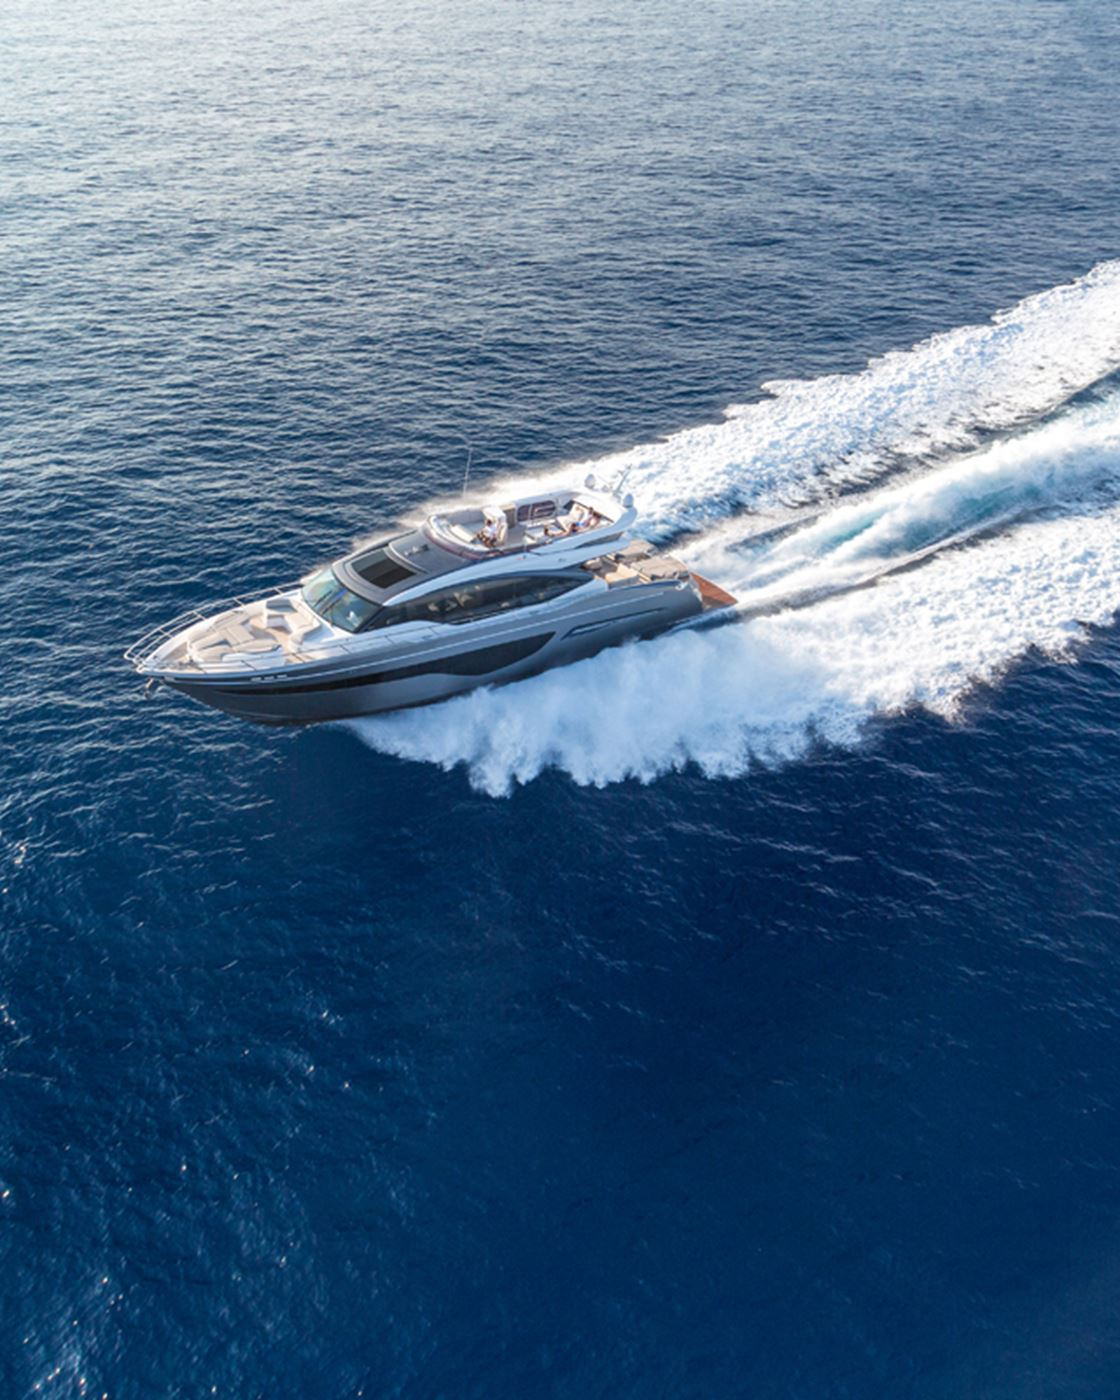 Princess Yachts British Luxury Yacht Manufacturer